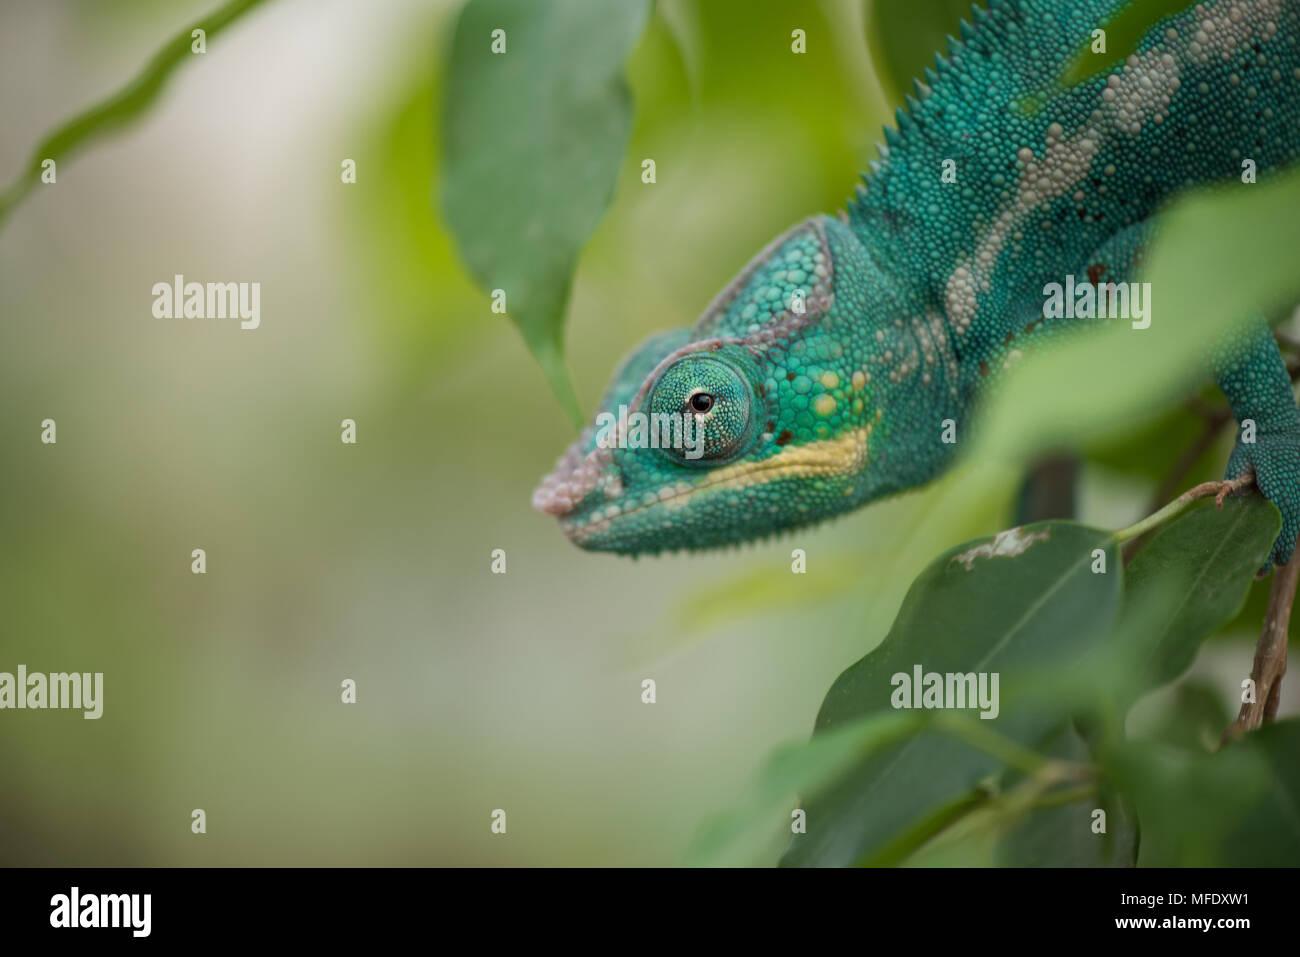 Panther chameleon with bright colors / furcifer pardalis / Madagascar wildlife / Nosy be / chameleon in leaves / blue chameleon - Stock Image